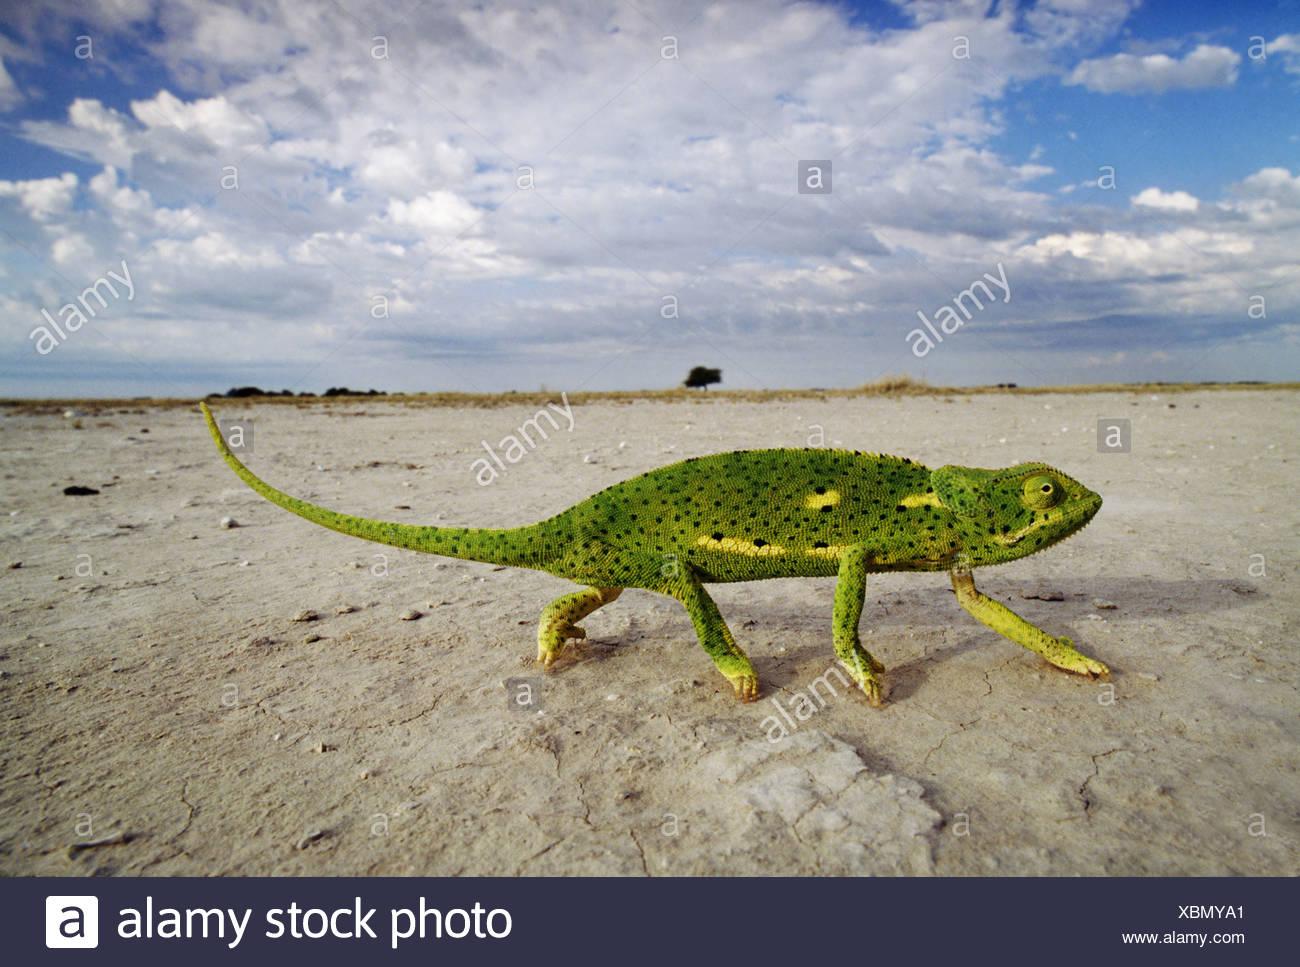 Flap-necked chameleon crossing salt pans Chamaeleo dilepis Makgadikgadi Pans Botswana Makgadikgadi Pans Botswana - Stock Image